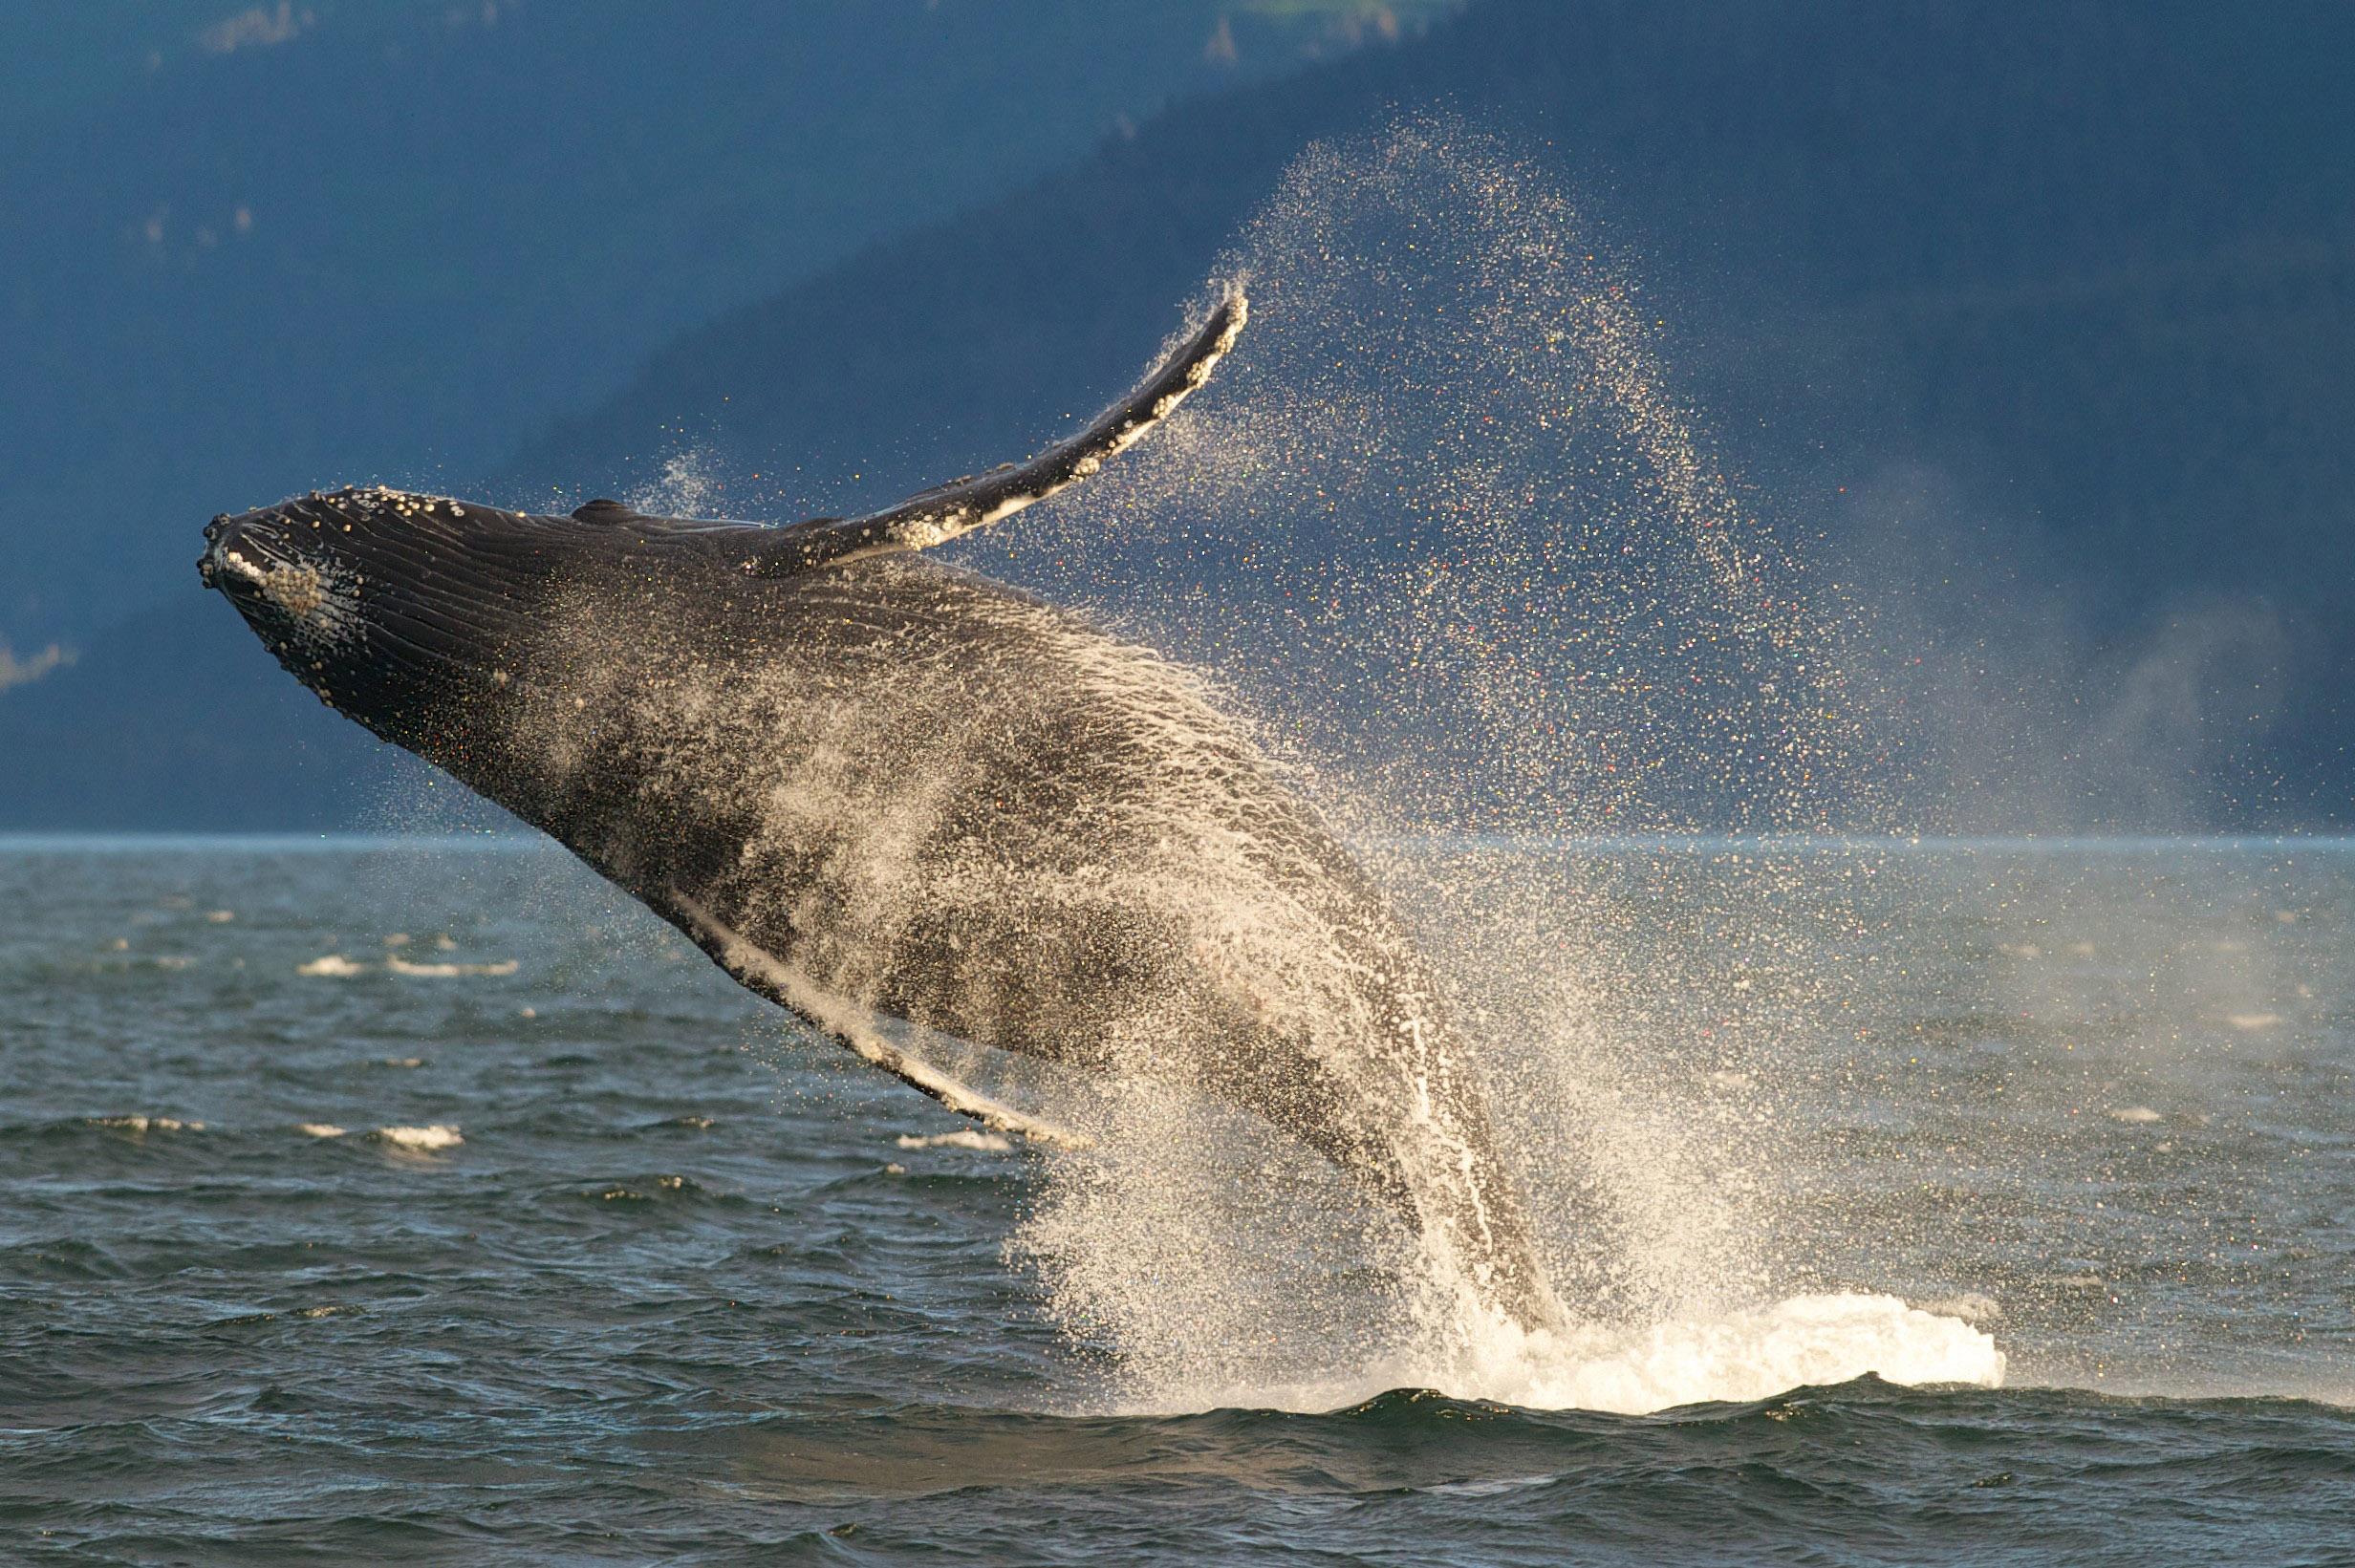 In this July 9, 2014 photo, an adult humpback whale breaches in Lynn Canal near Juneau, Alaska.